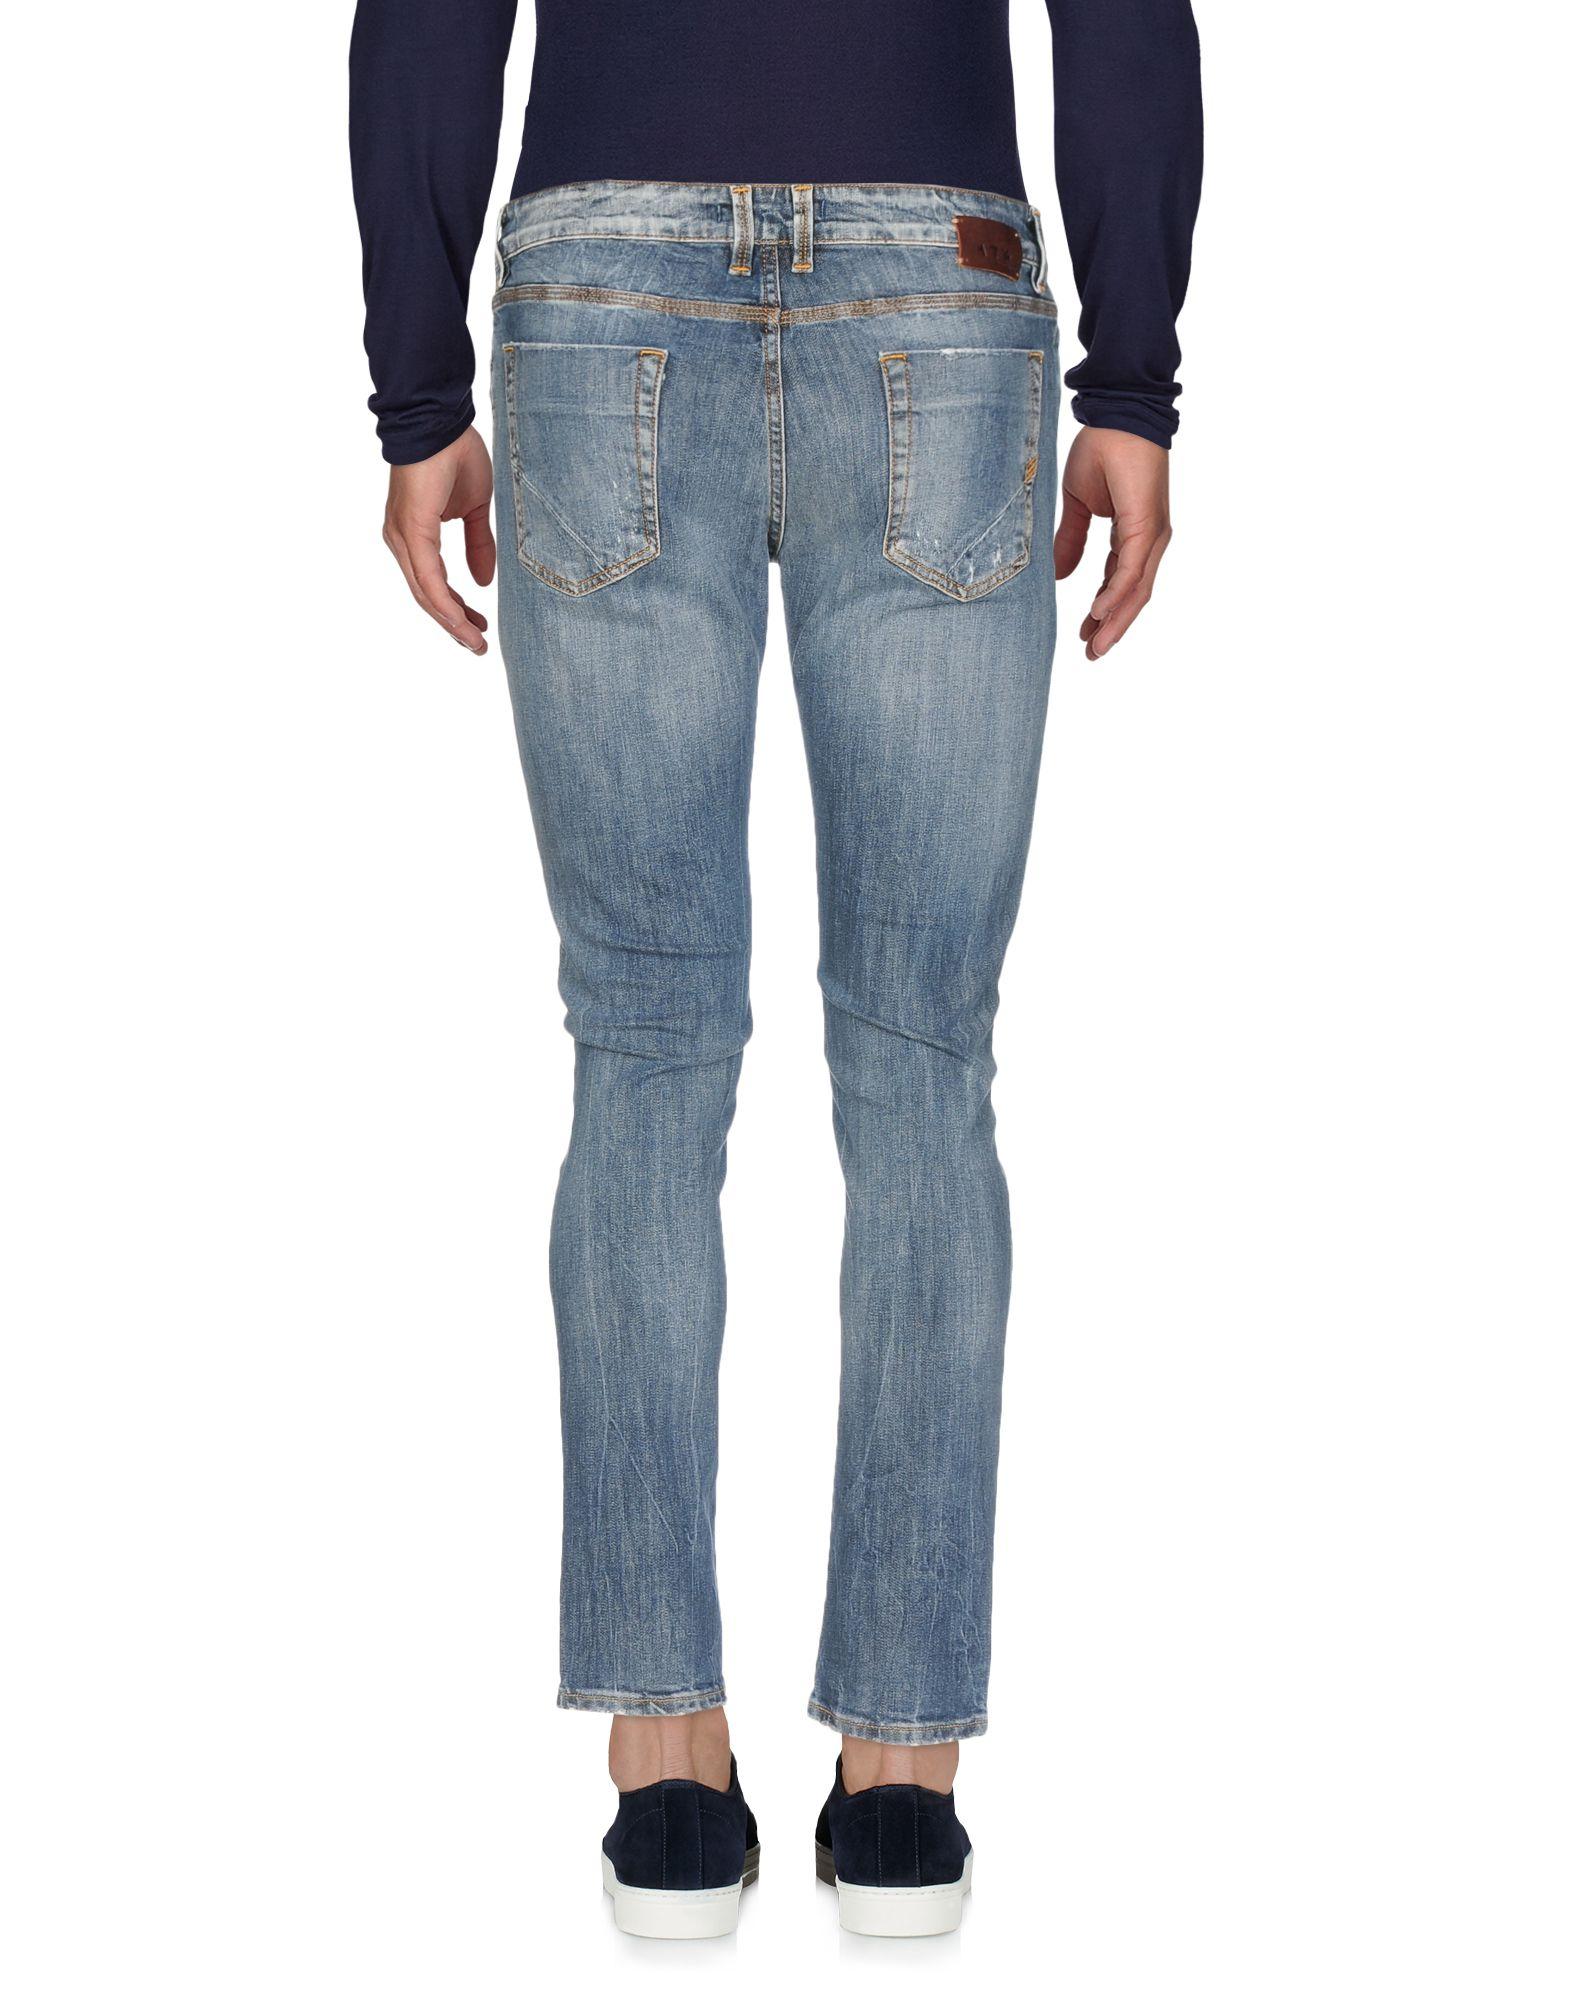 Pantaloni Jeans Wool 172 Uomo Uomo Uomo - 42673797SP 9e3398